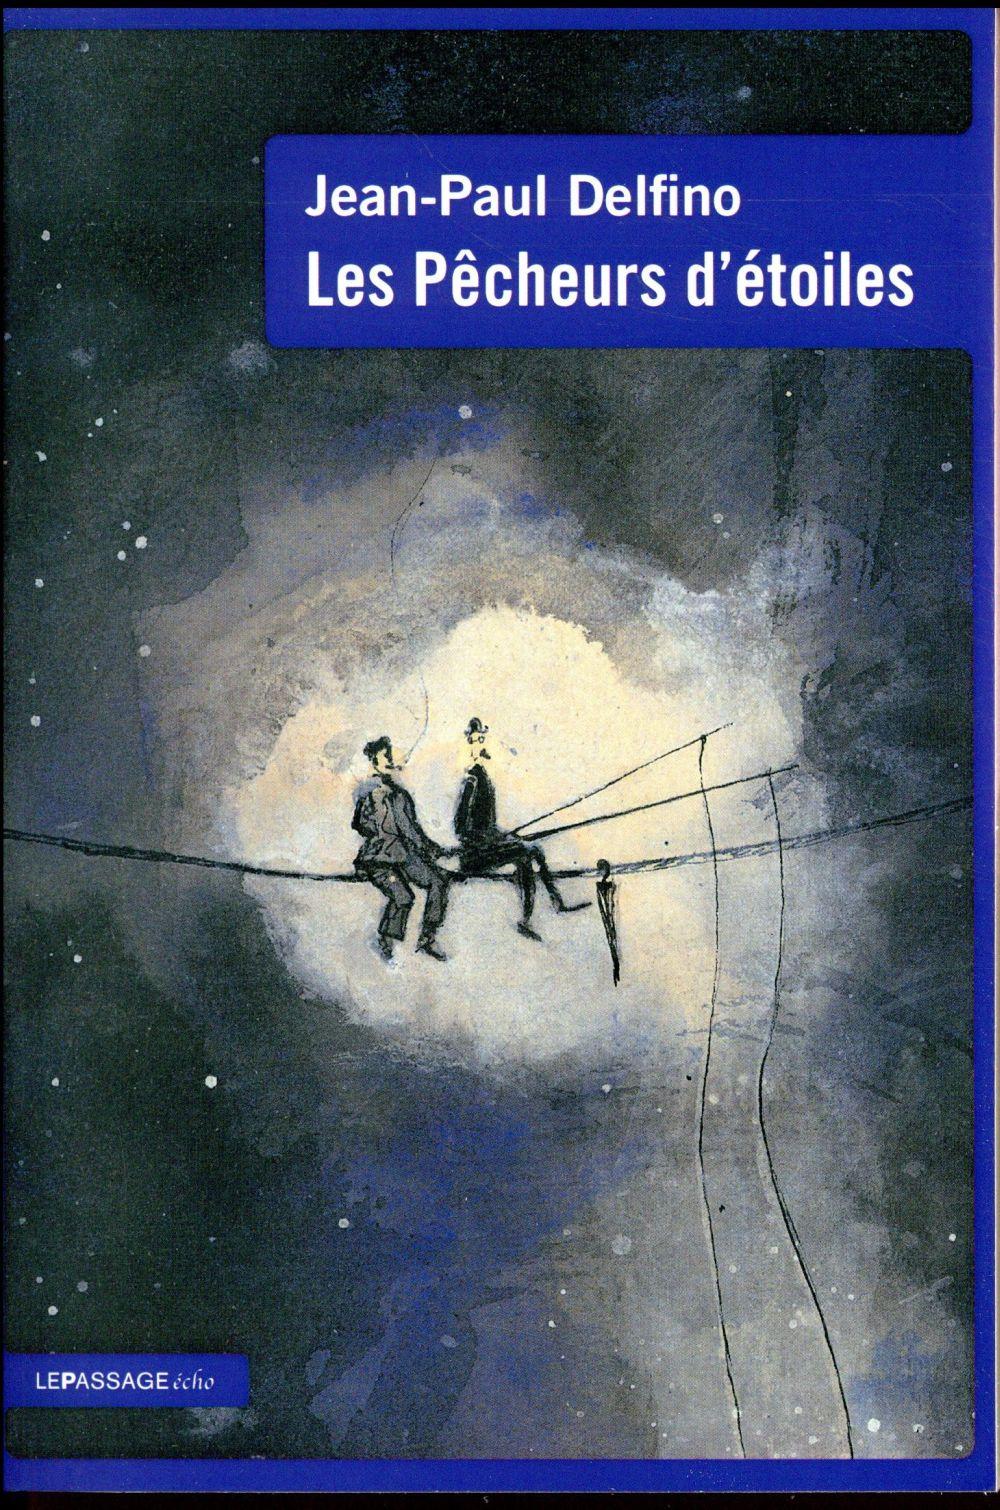 Delfino Jean-Paul - LES PECHEURS D'ETOILES